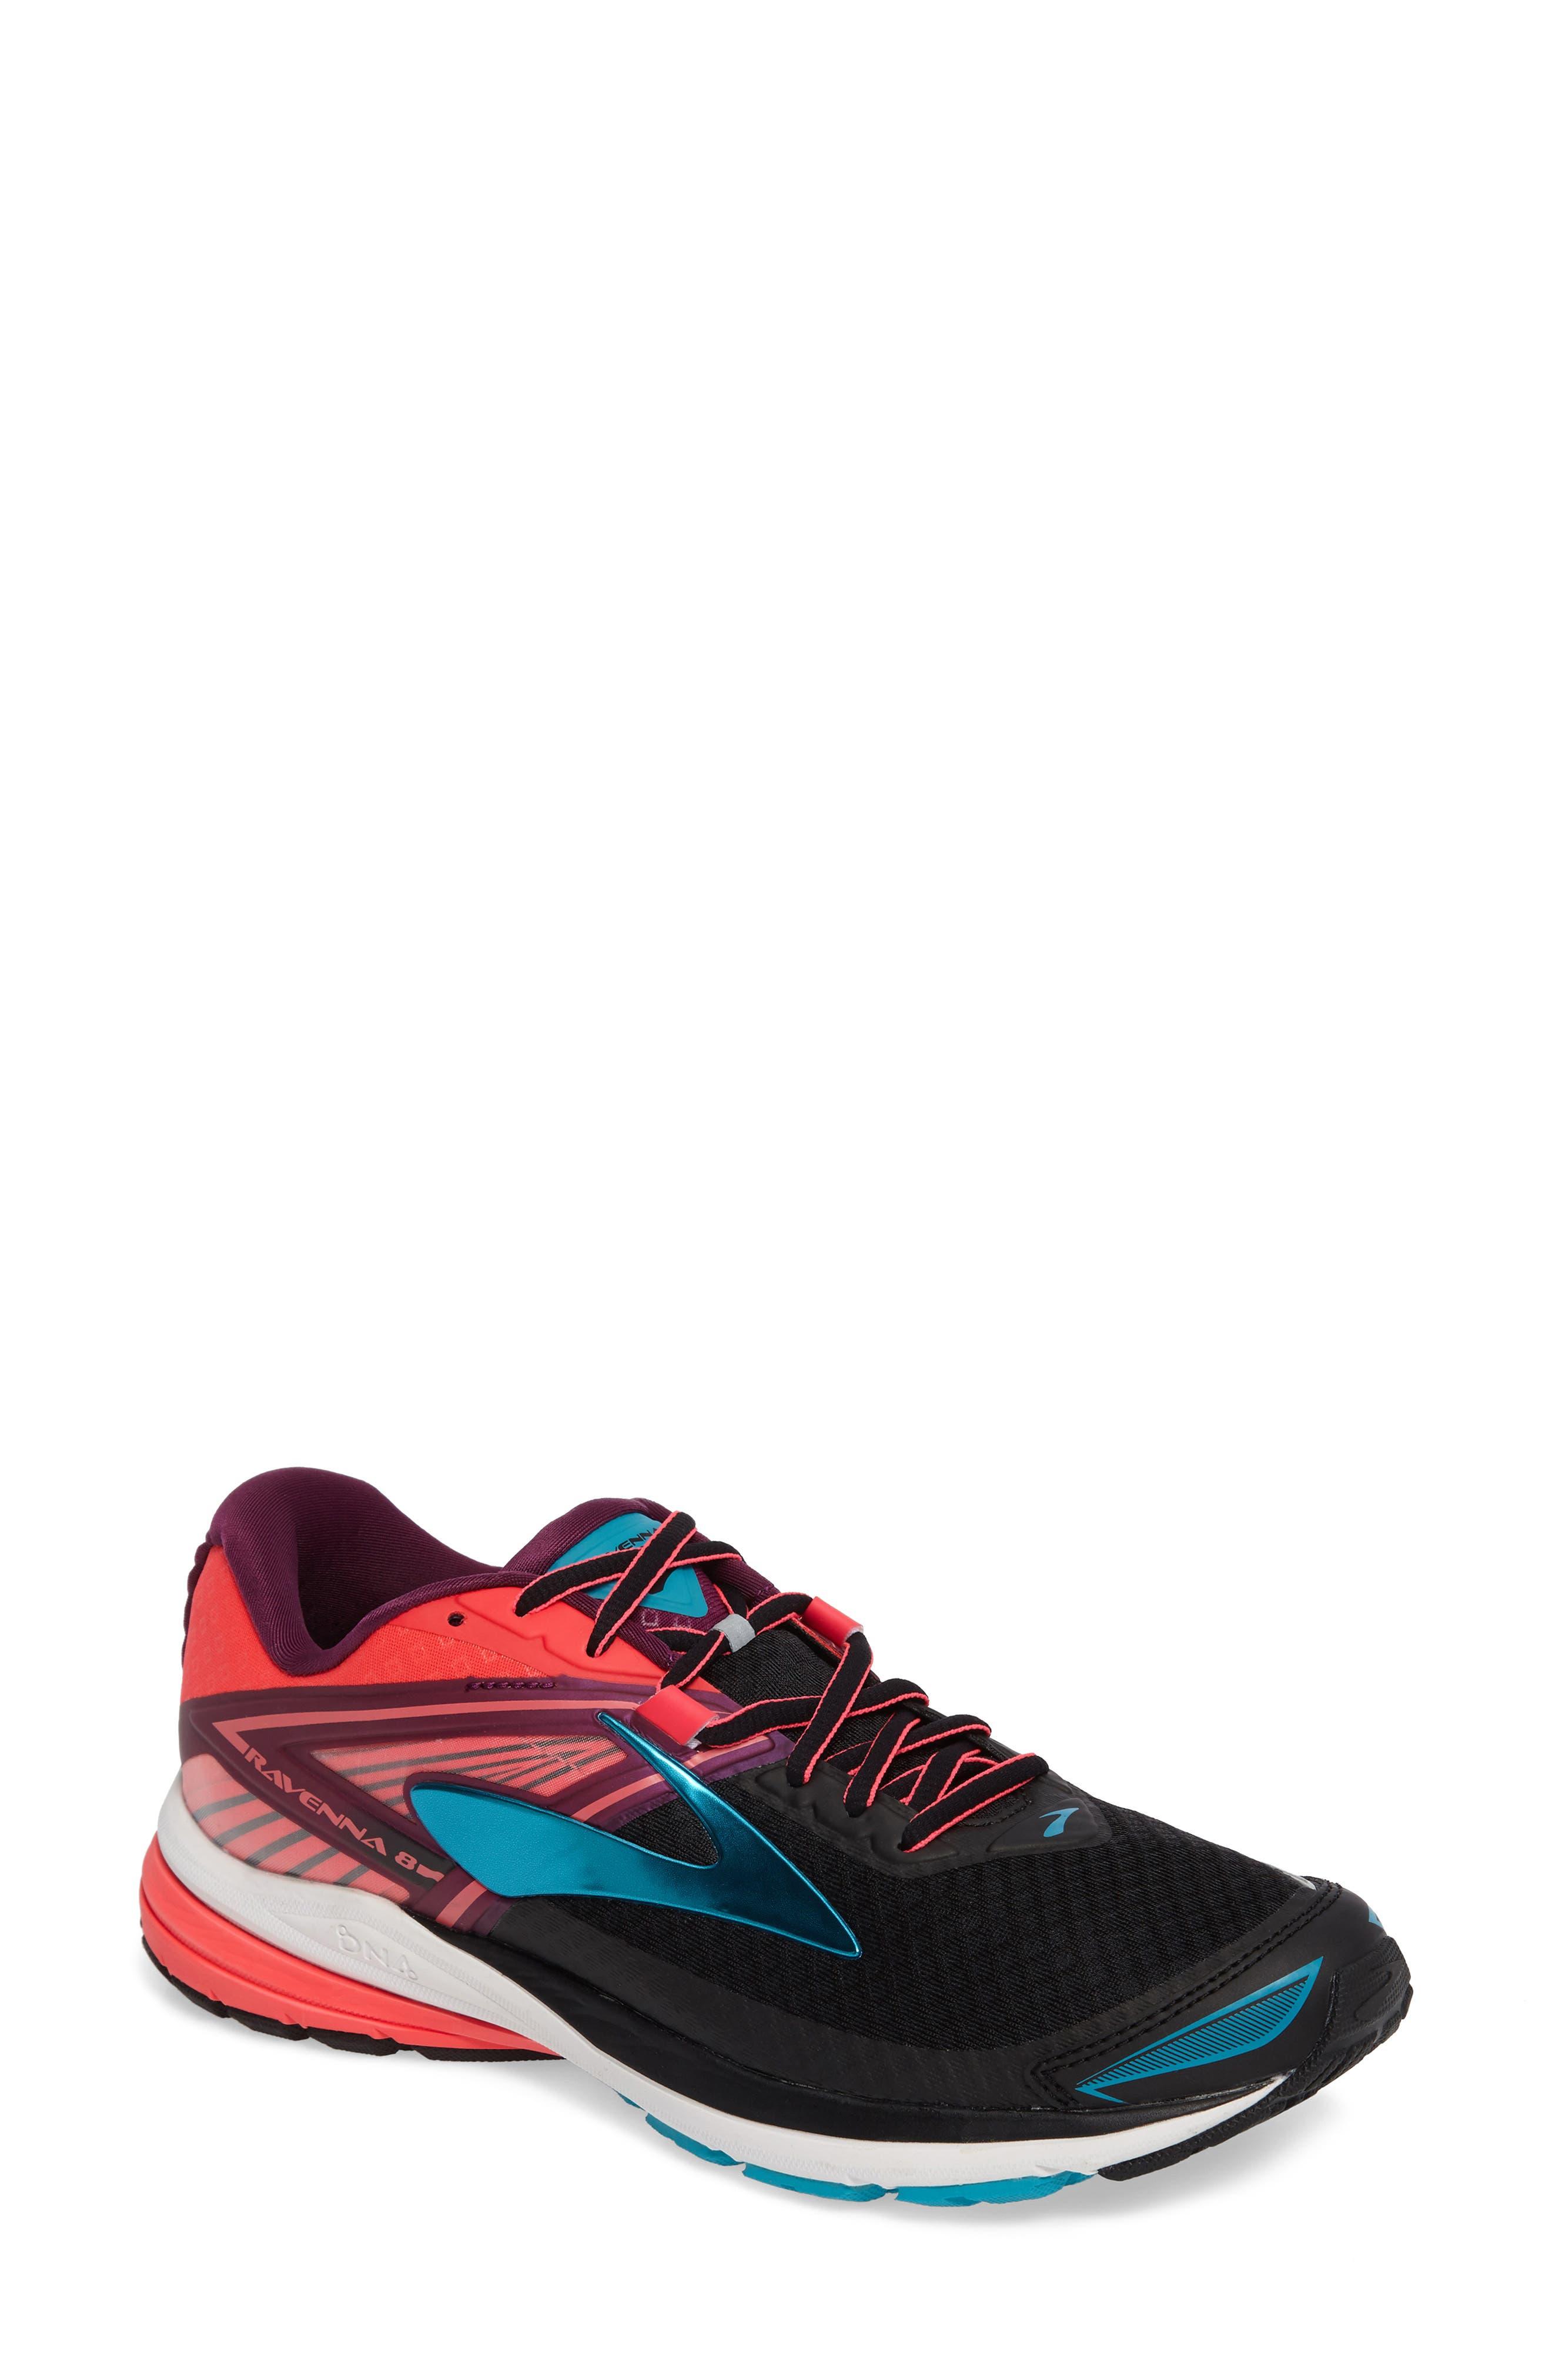 Ravenna 8 Running Shoe,                         Main,                         color, 013